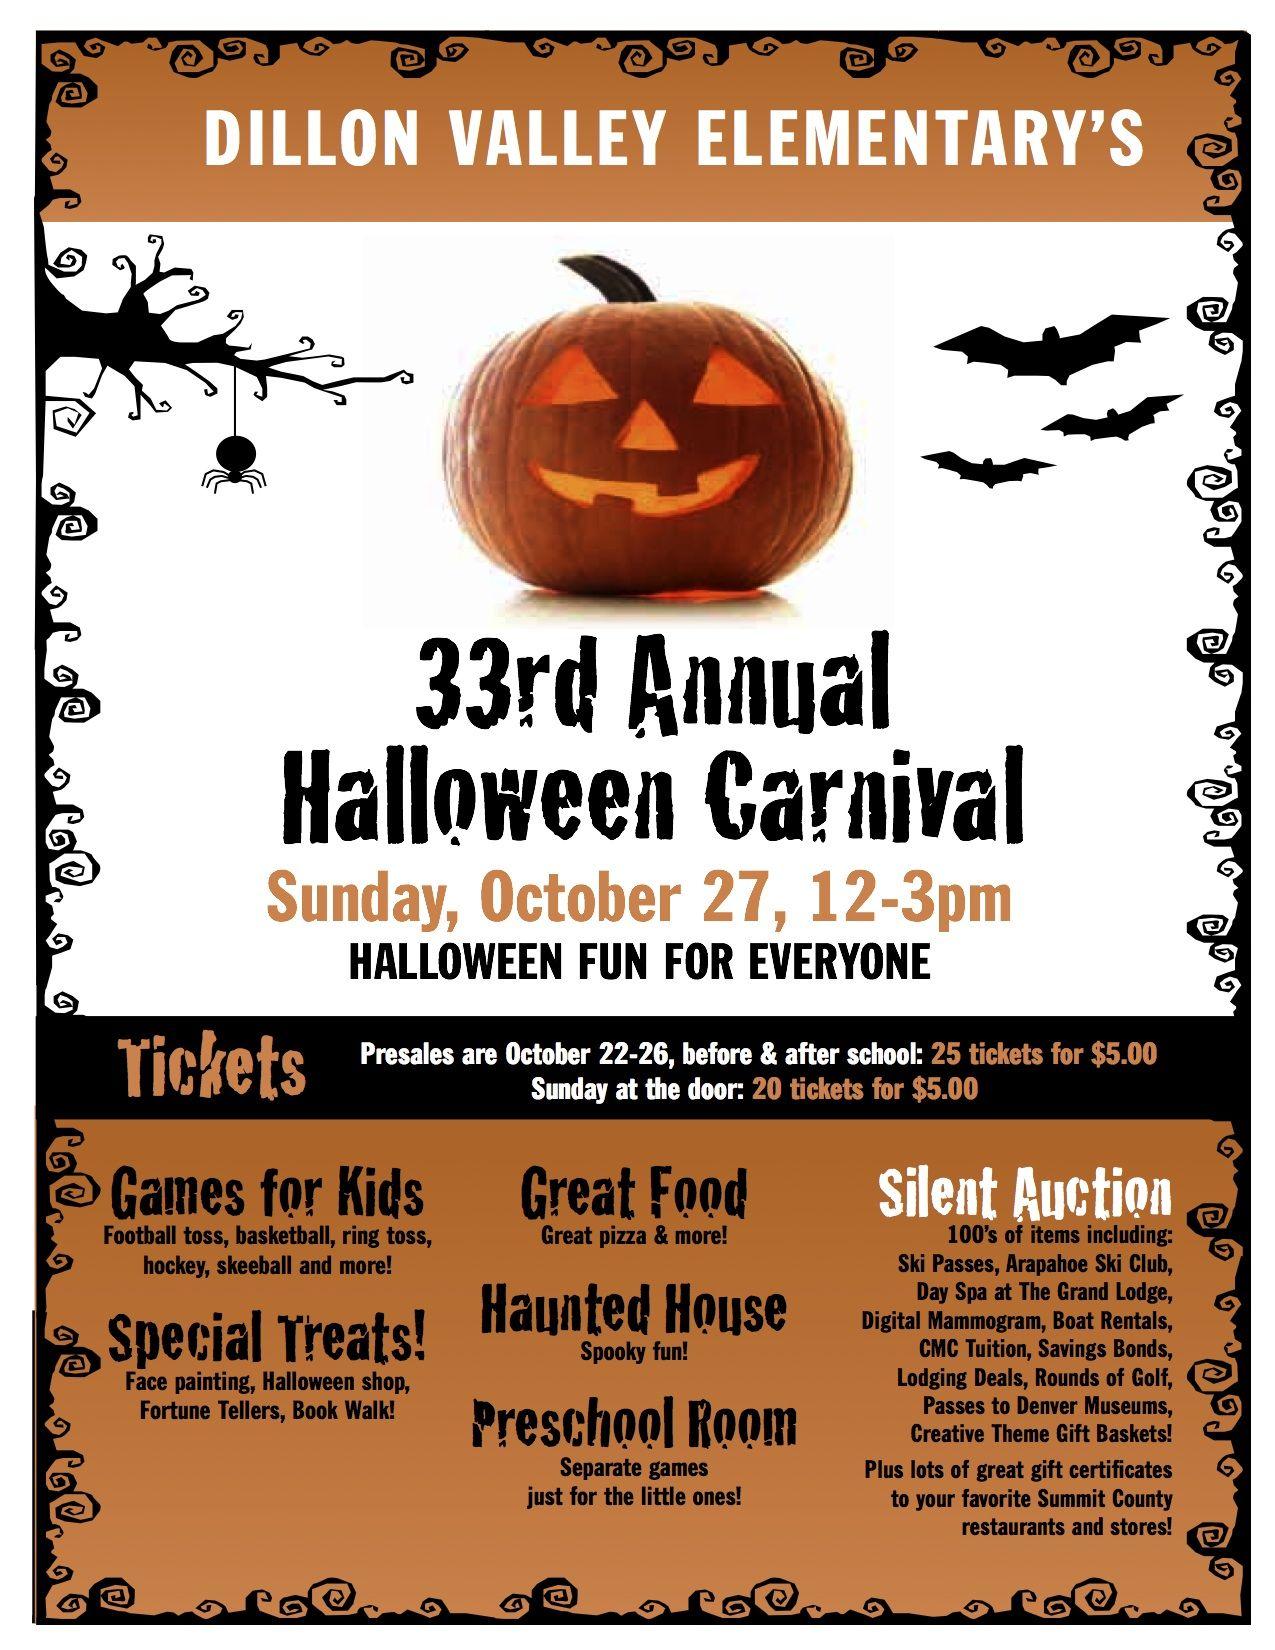 Dillon Valley Elementary School Halloween Carnival October 27th ...